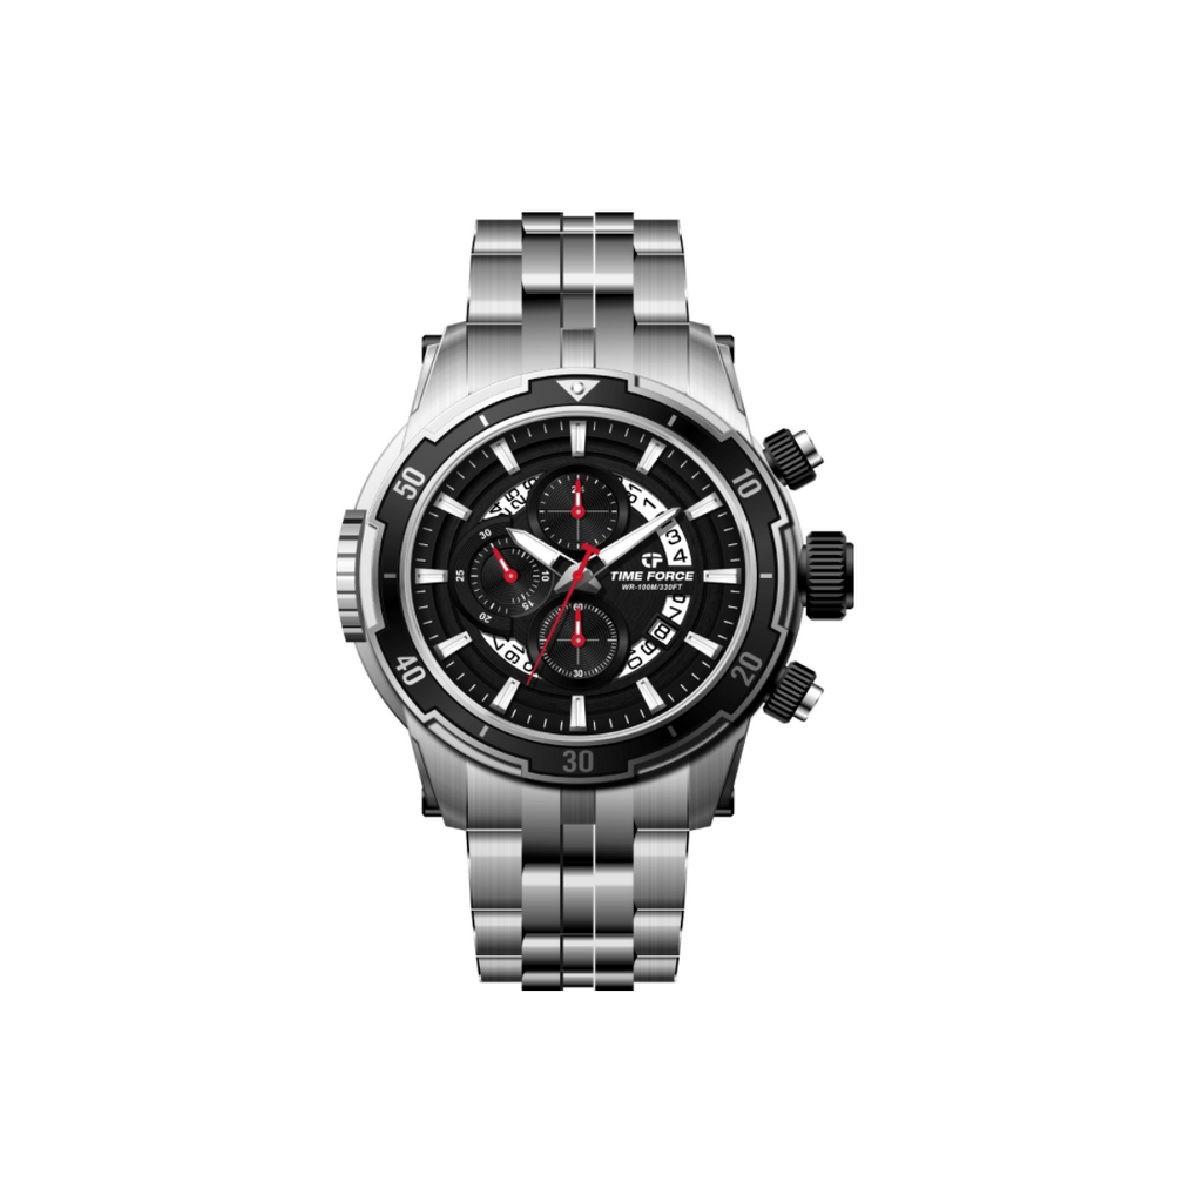 https://www.gaberjoyeria.com/5957-thickbox_default/reloj-time-force-.jpg